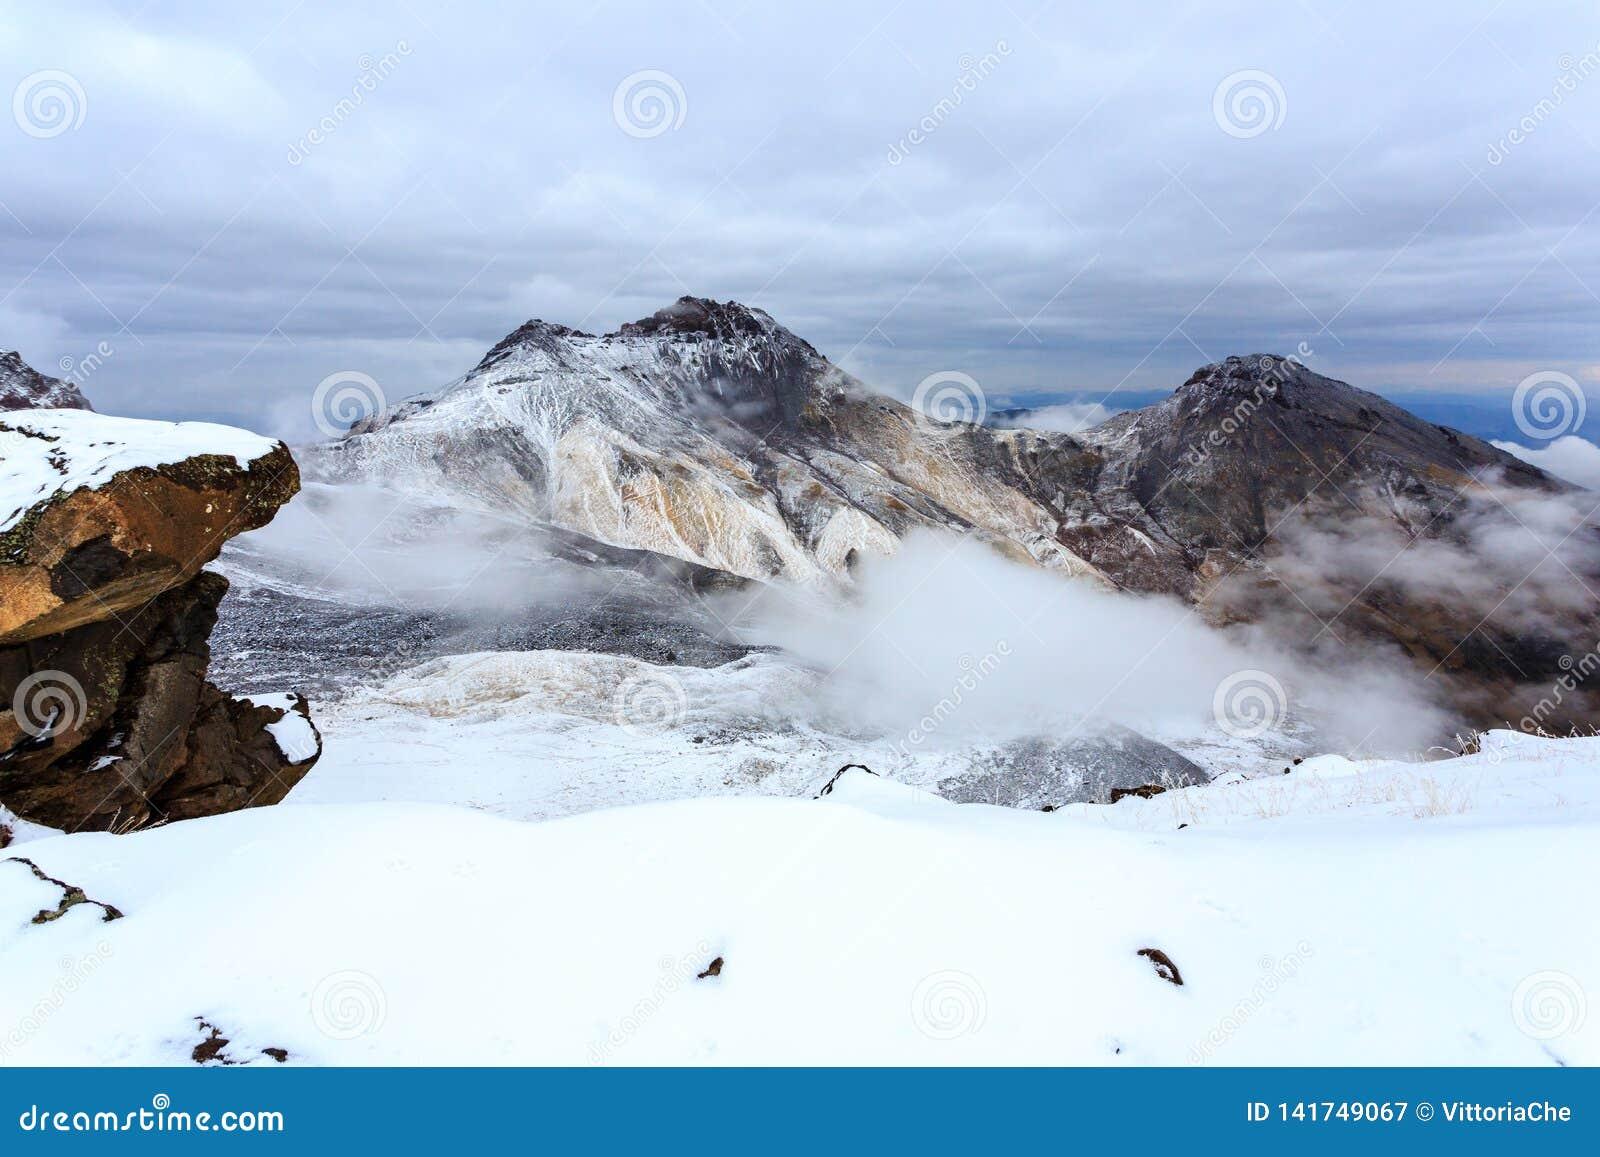 Cráter volcánico del soporte Aragats, cumbre septentrional, en 4.090 m, Armenia